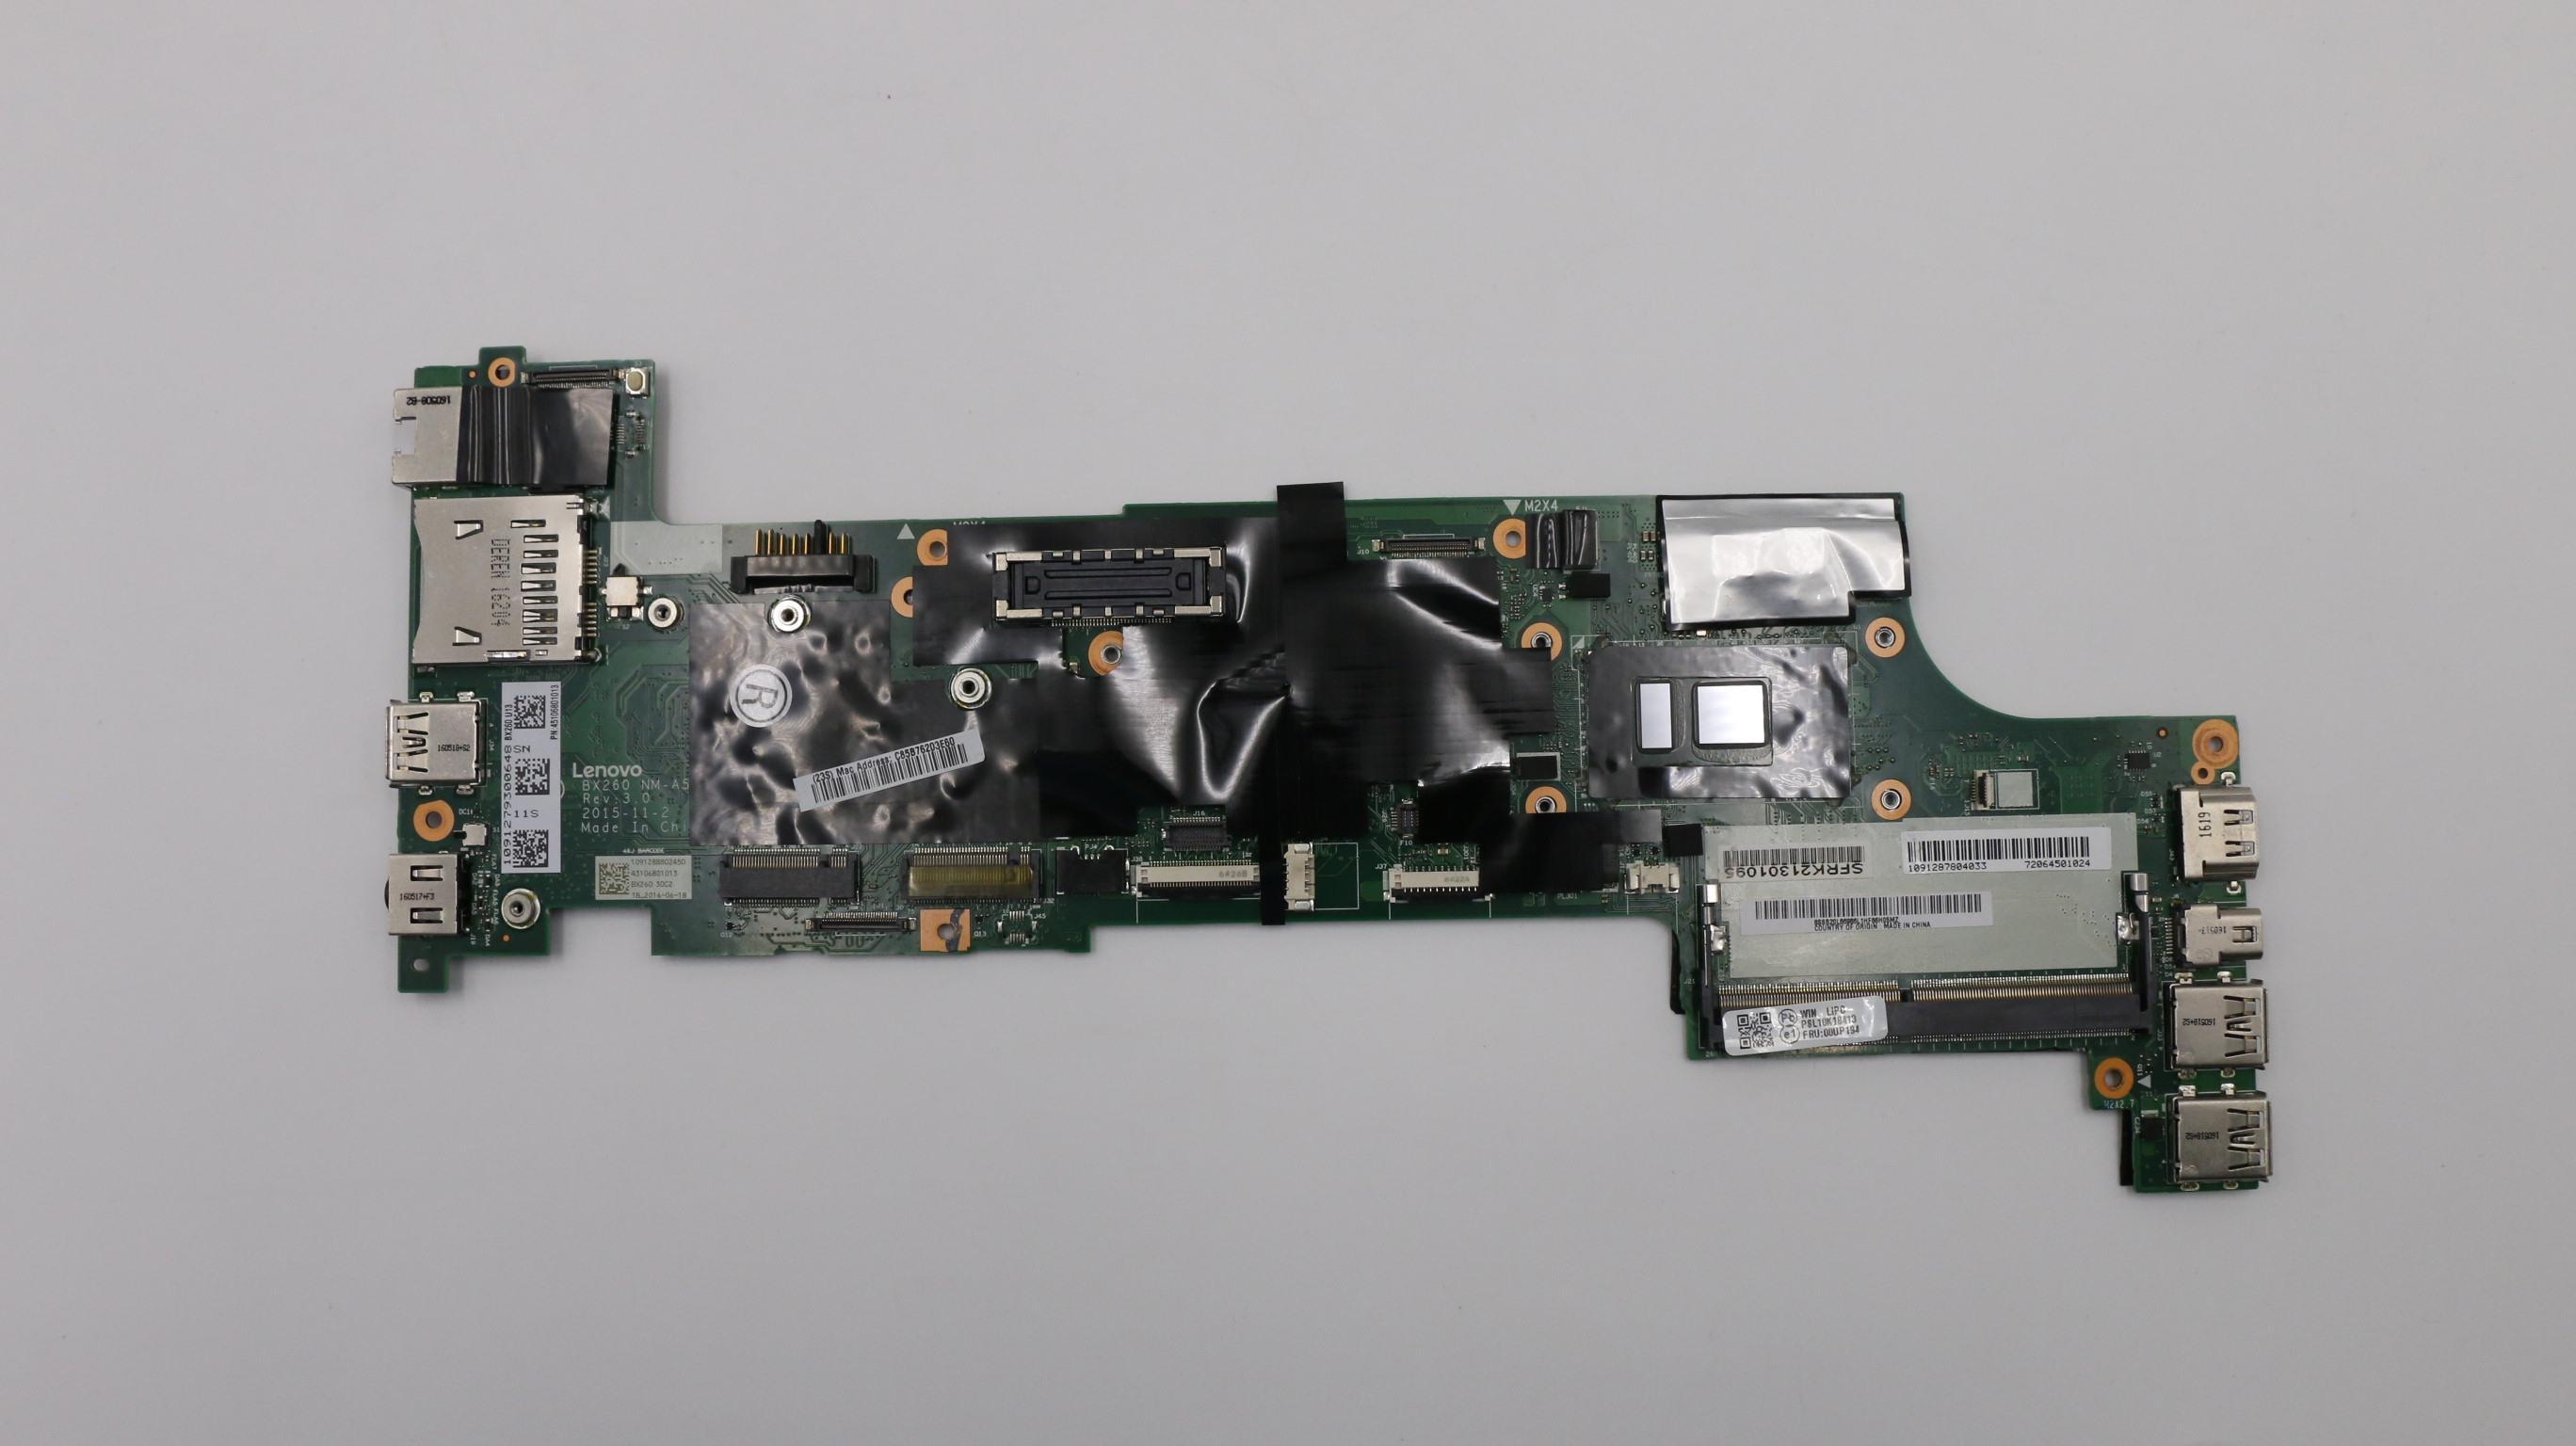 Thinkpad X260 i3-6100U Laptop Motherboard FRU NM-A531 00UP216 01EN219 00UP220 01YT065 01HX053 01YT035 01EN191 00UP188 01YT036